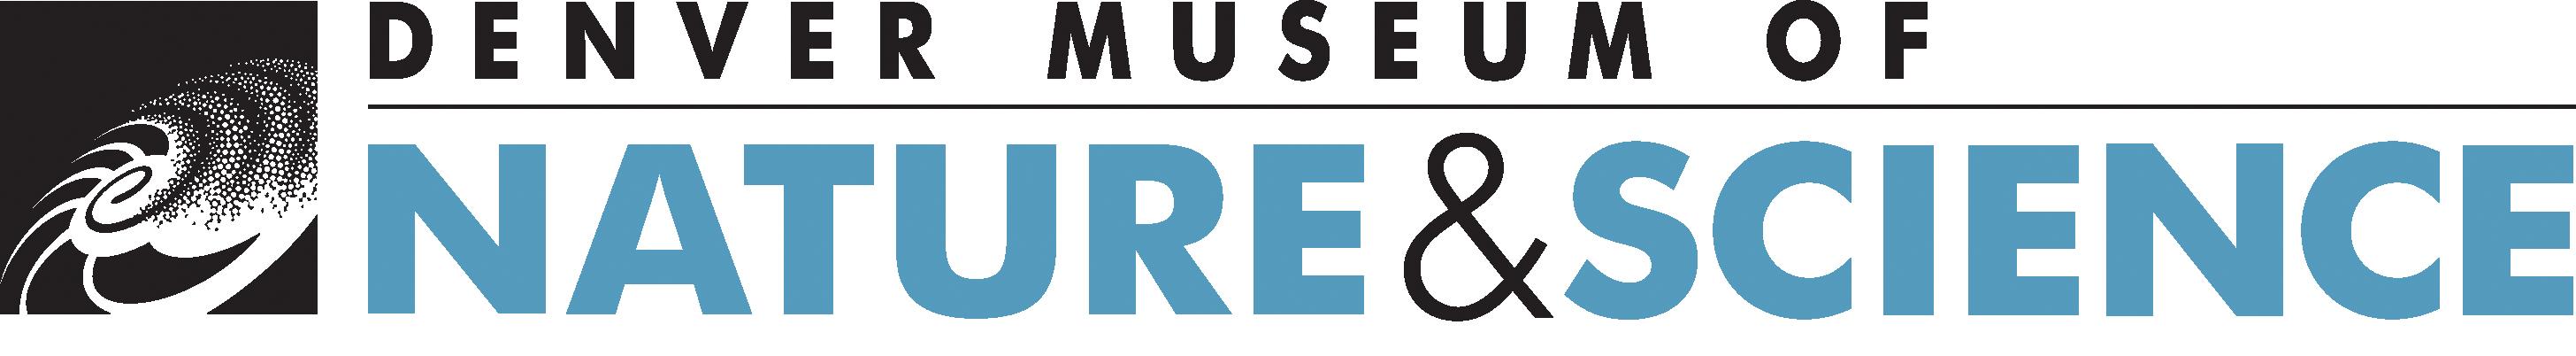 Denver_museum_beresford